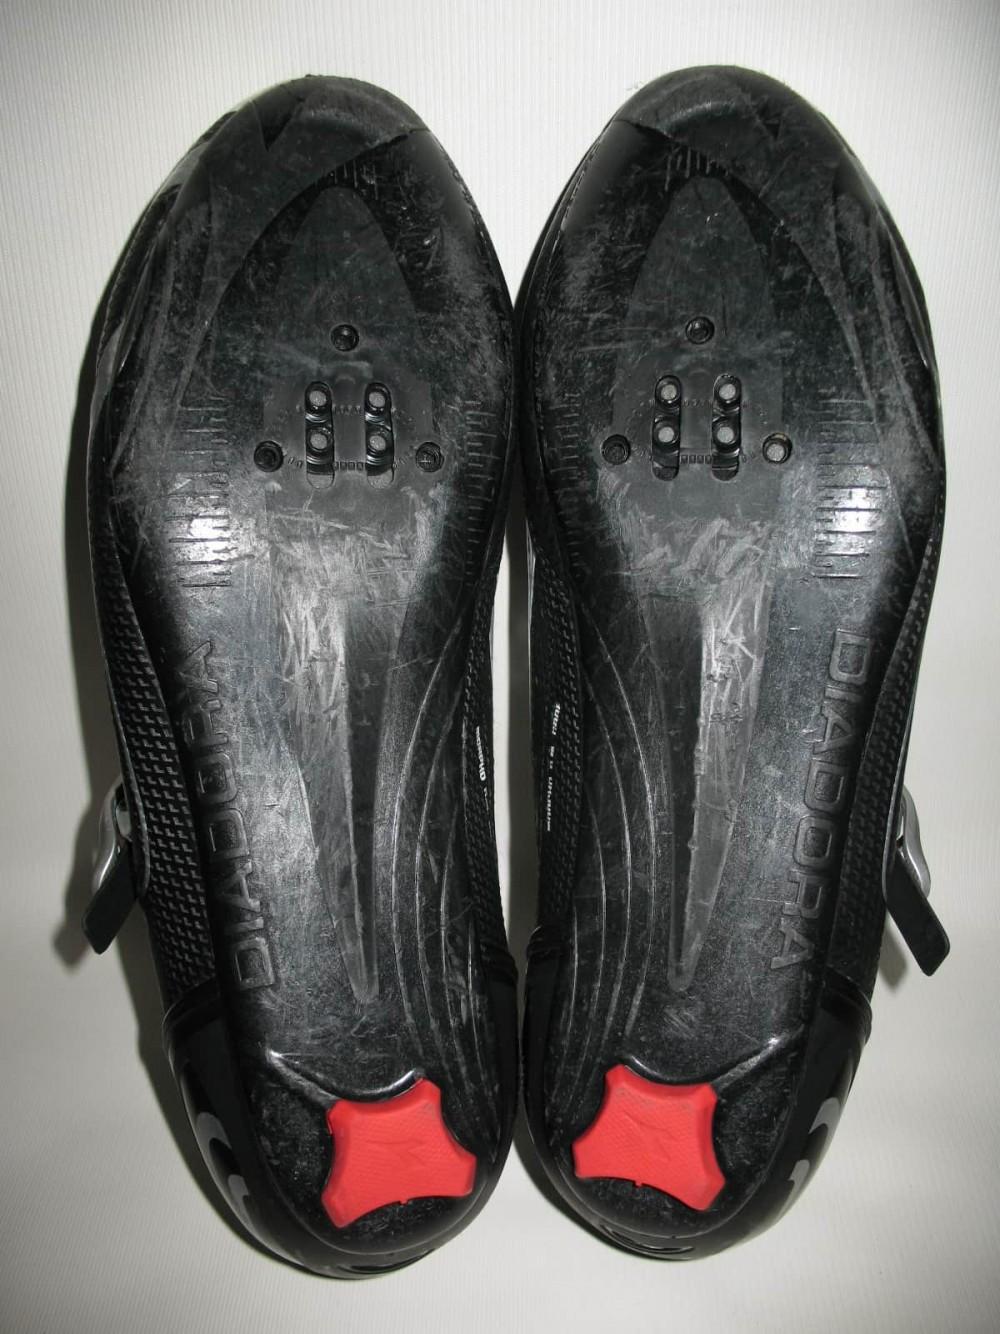 Велотуфли DIADORA aerospeed 2 road shoes (размер US13.5/UK13/EU48(на стопу 305 mm)) - 9